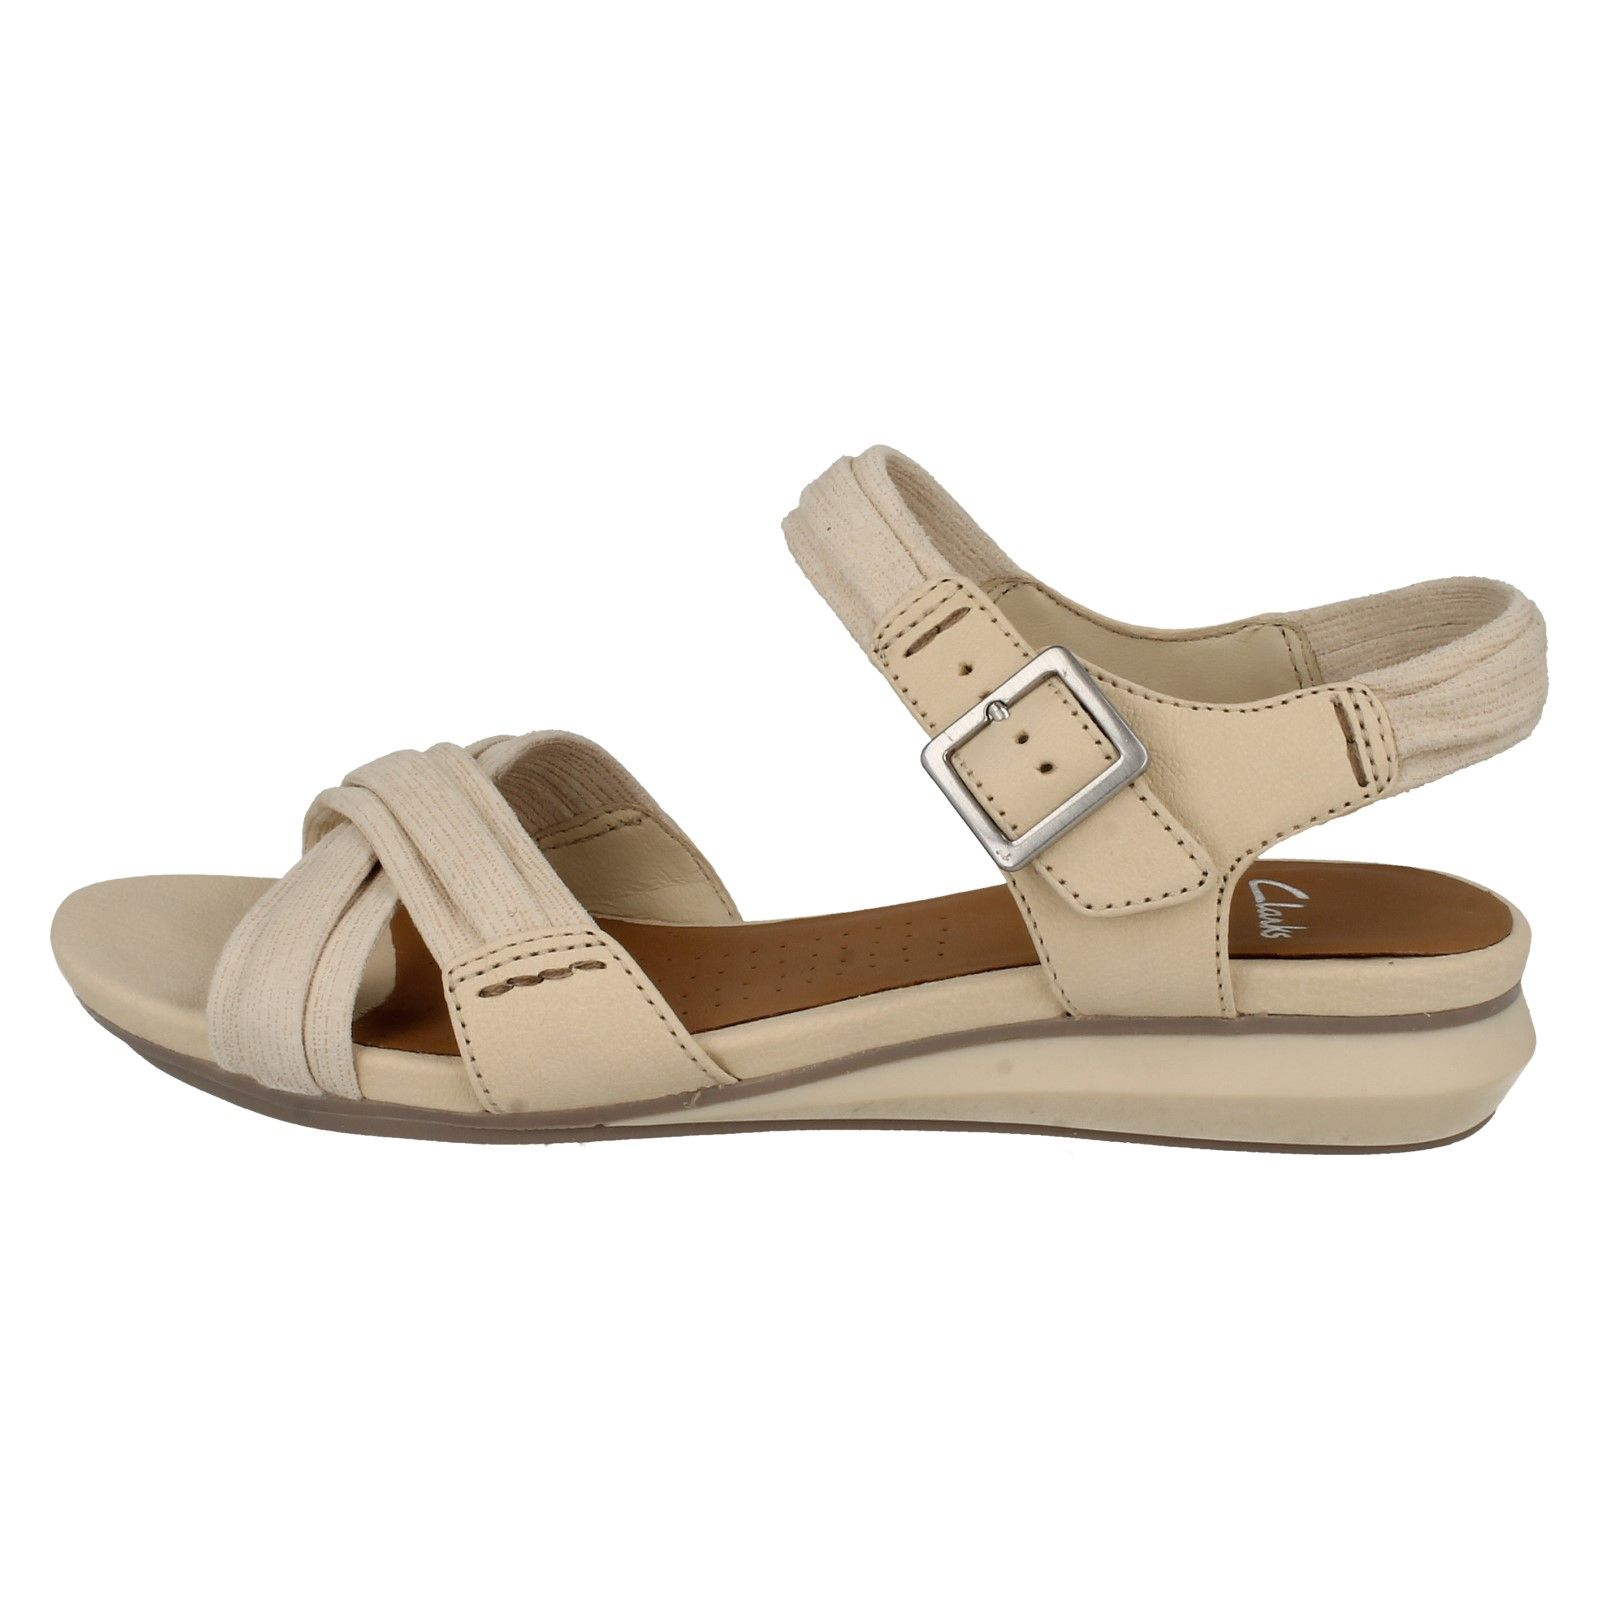 clarks active air sandals ladies